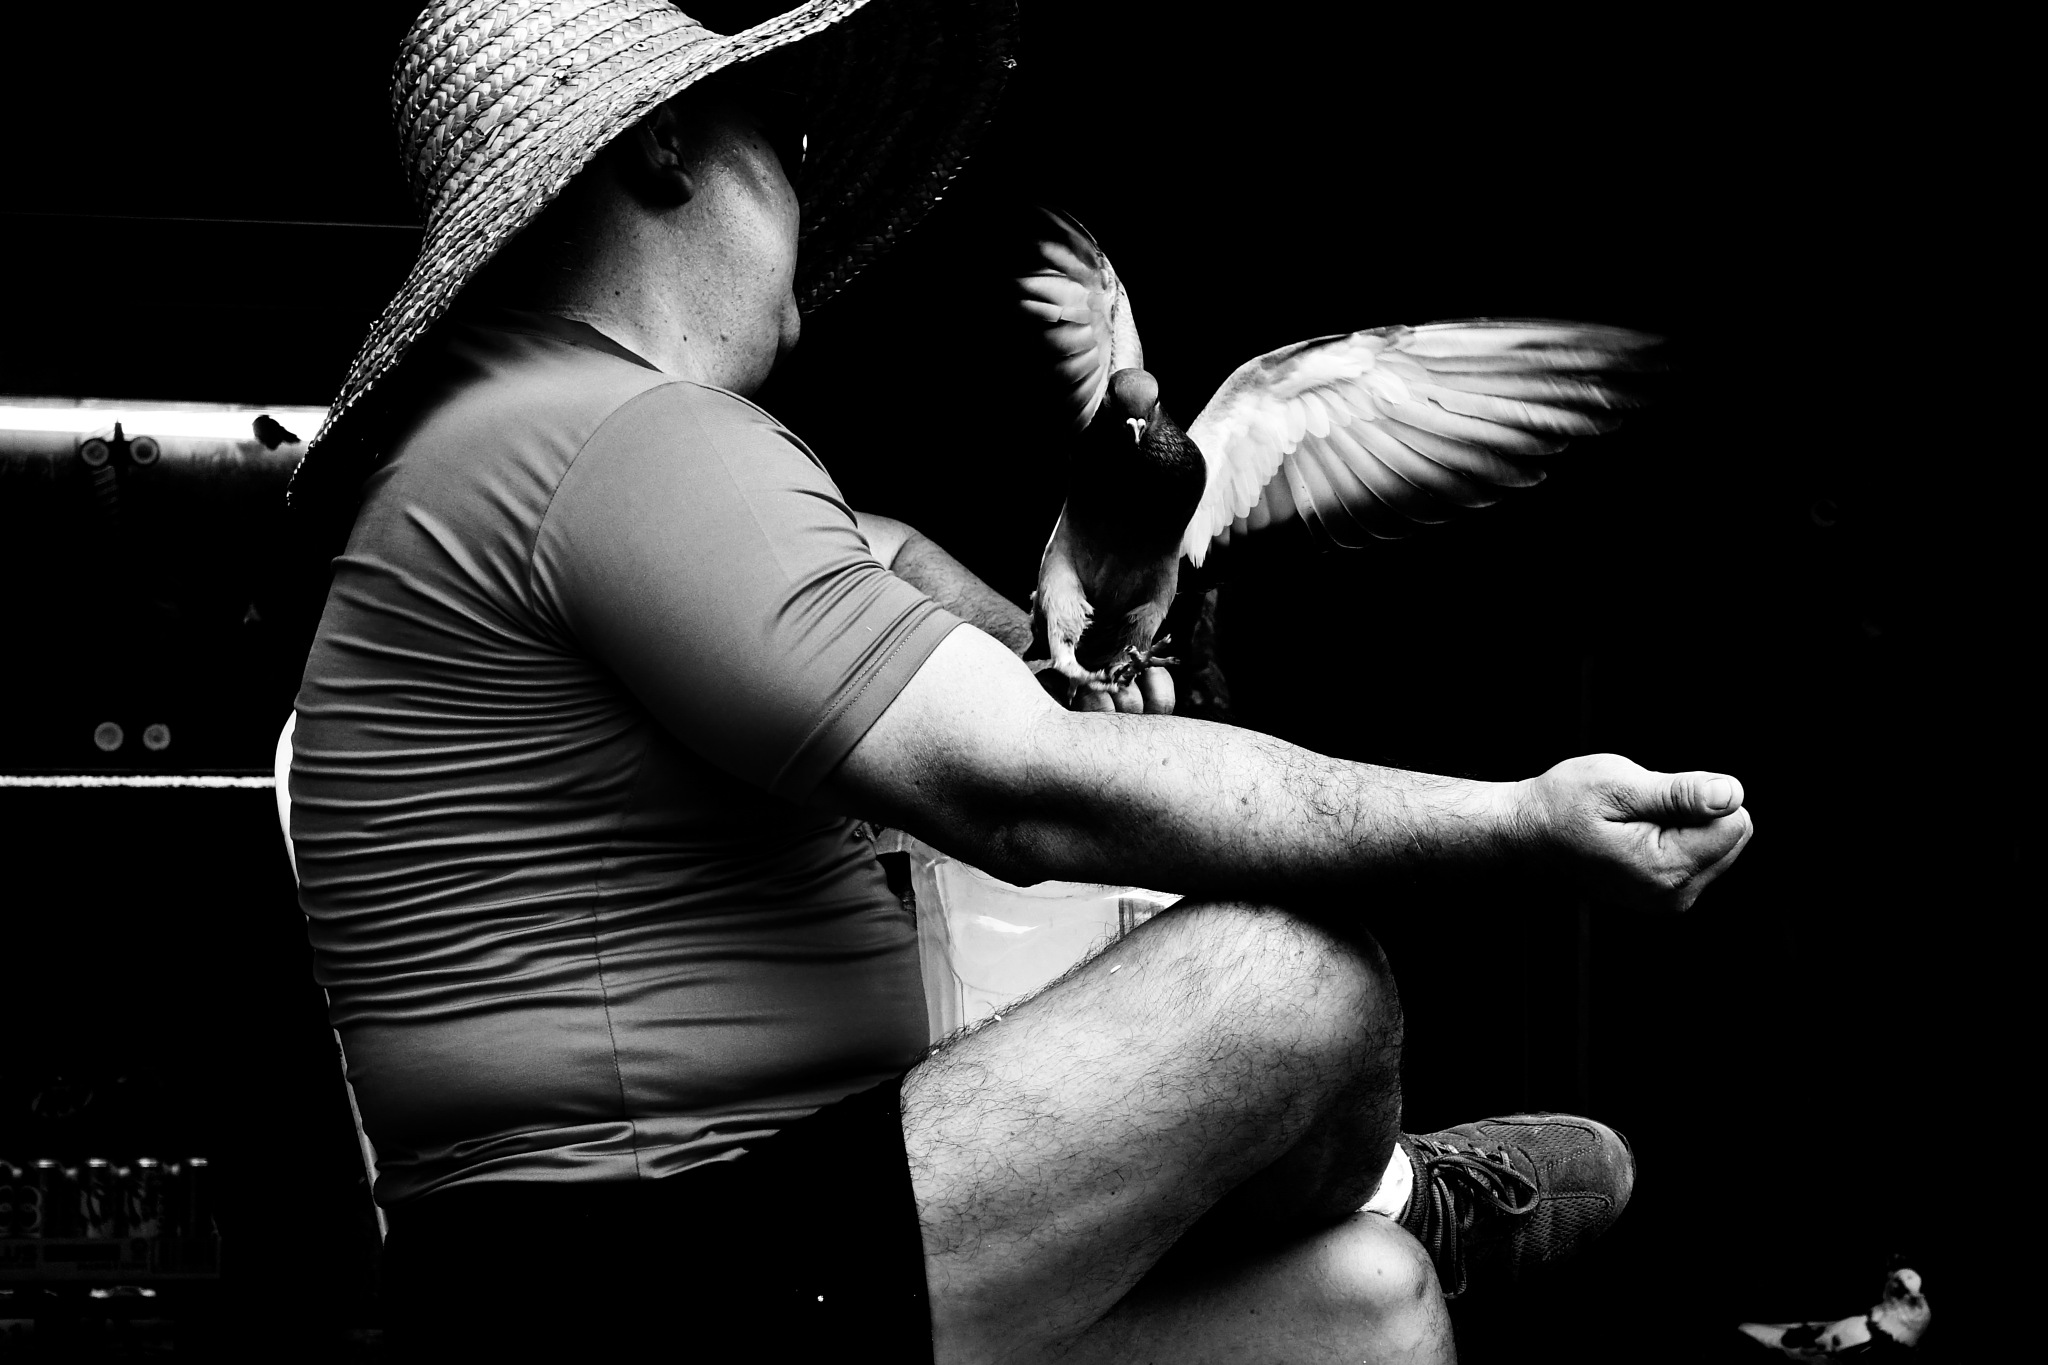 the bird-man  by marvinbuhian